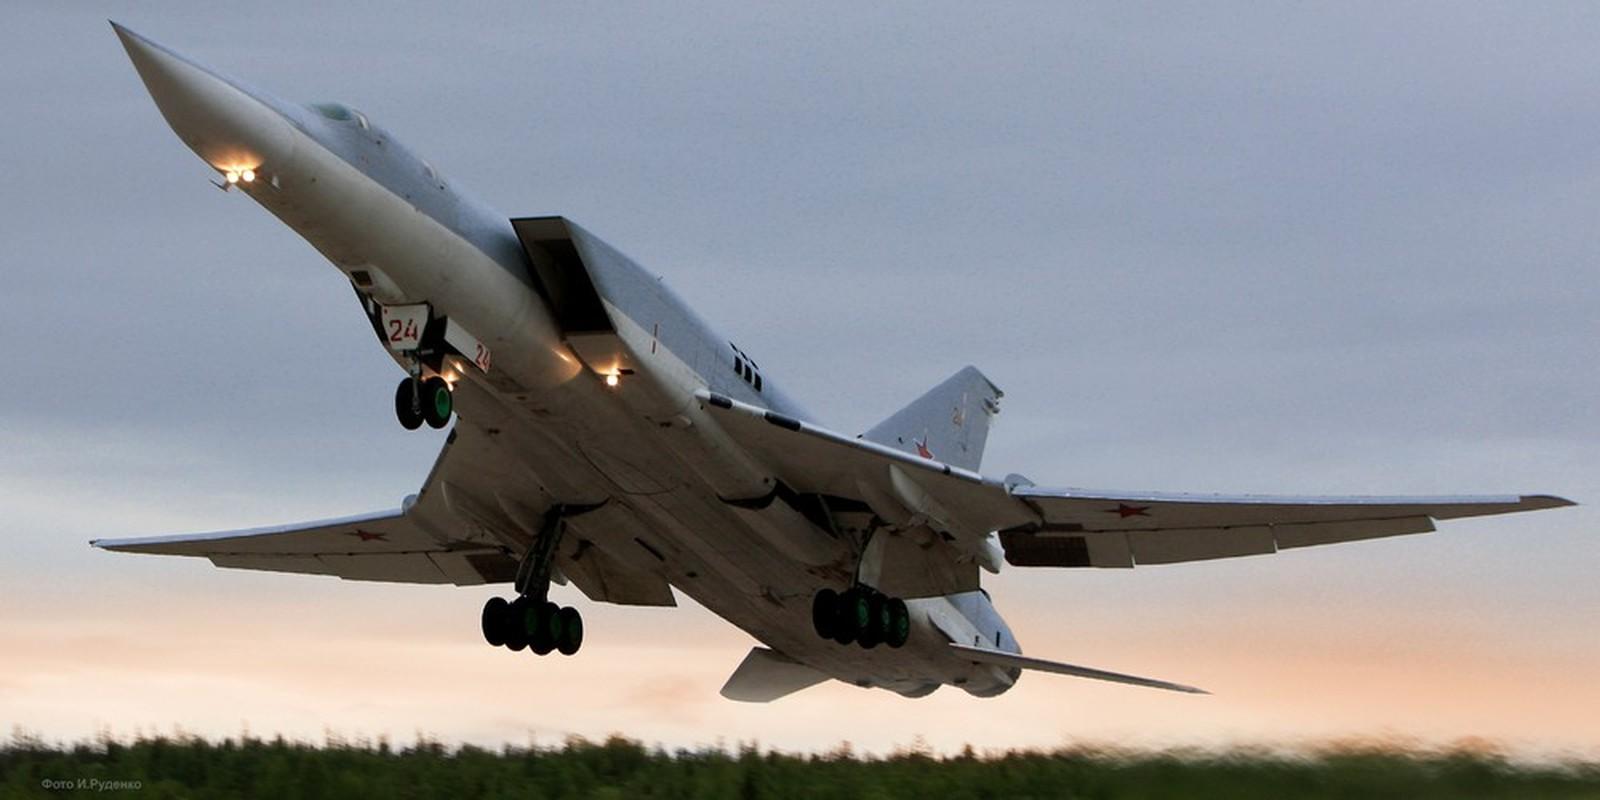 Oanh tac co Tu-22M3 xuat hien o Iran, vi sao Israel cung